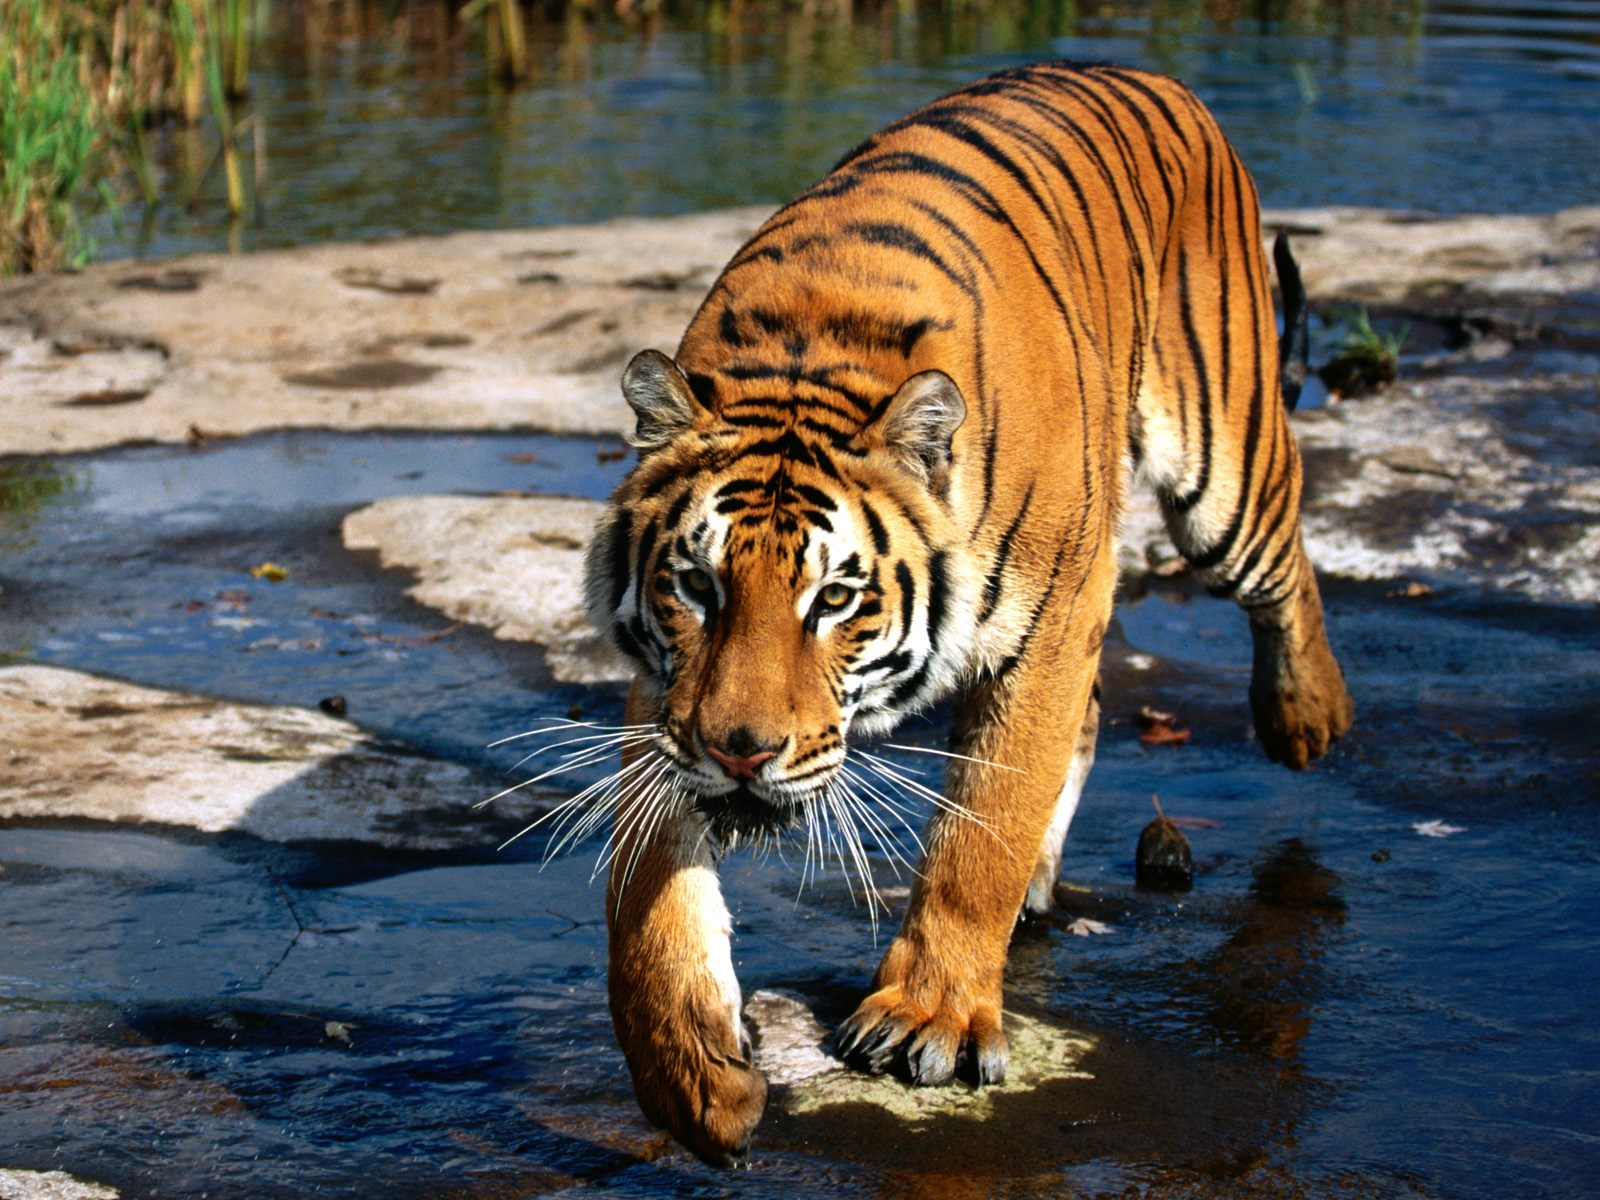 tiger background wallpapers | desktop background wallpapers